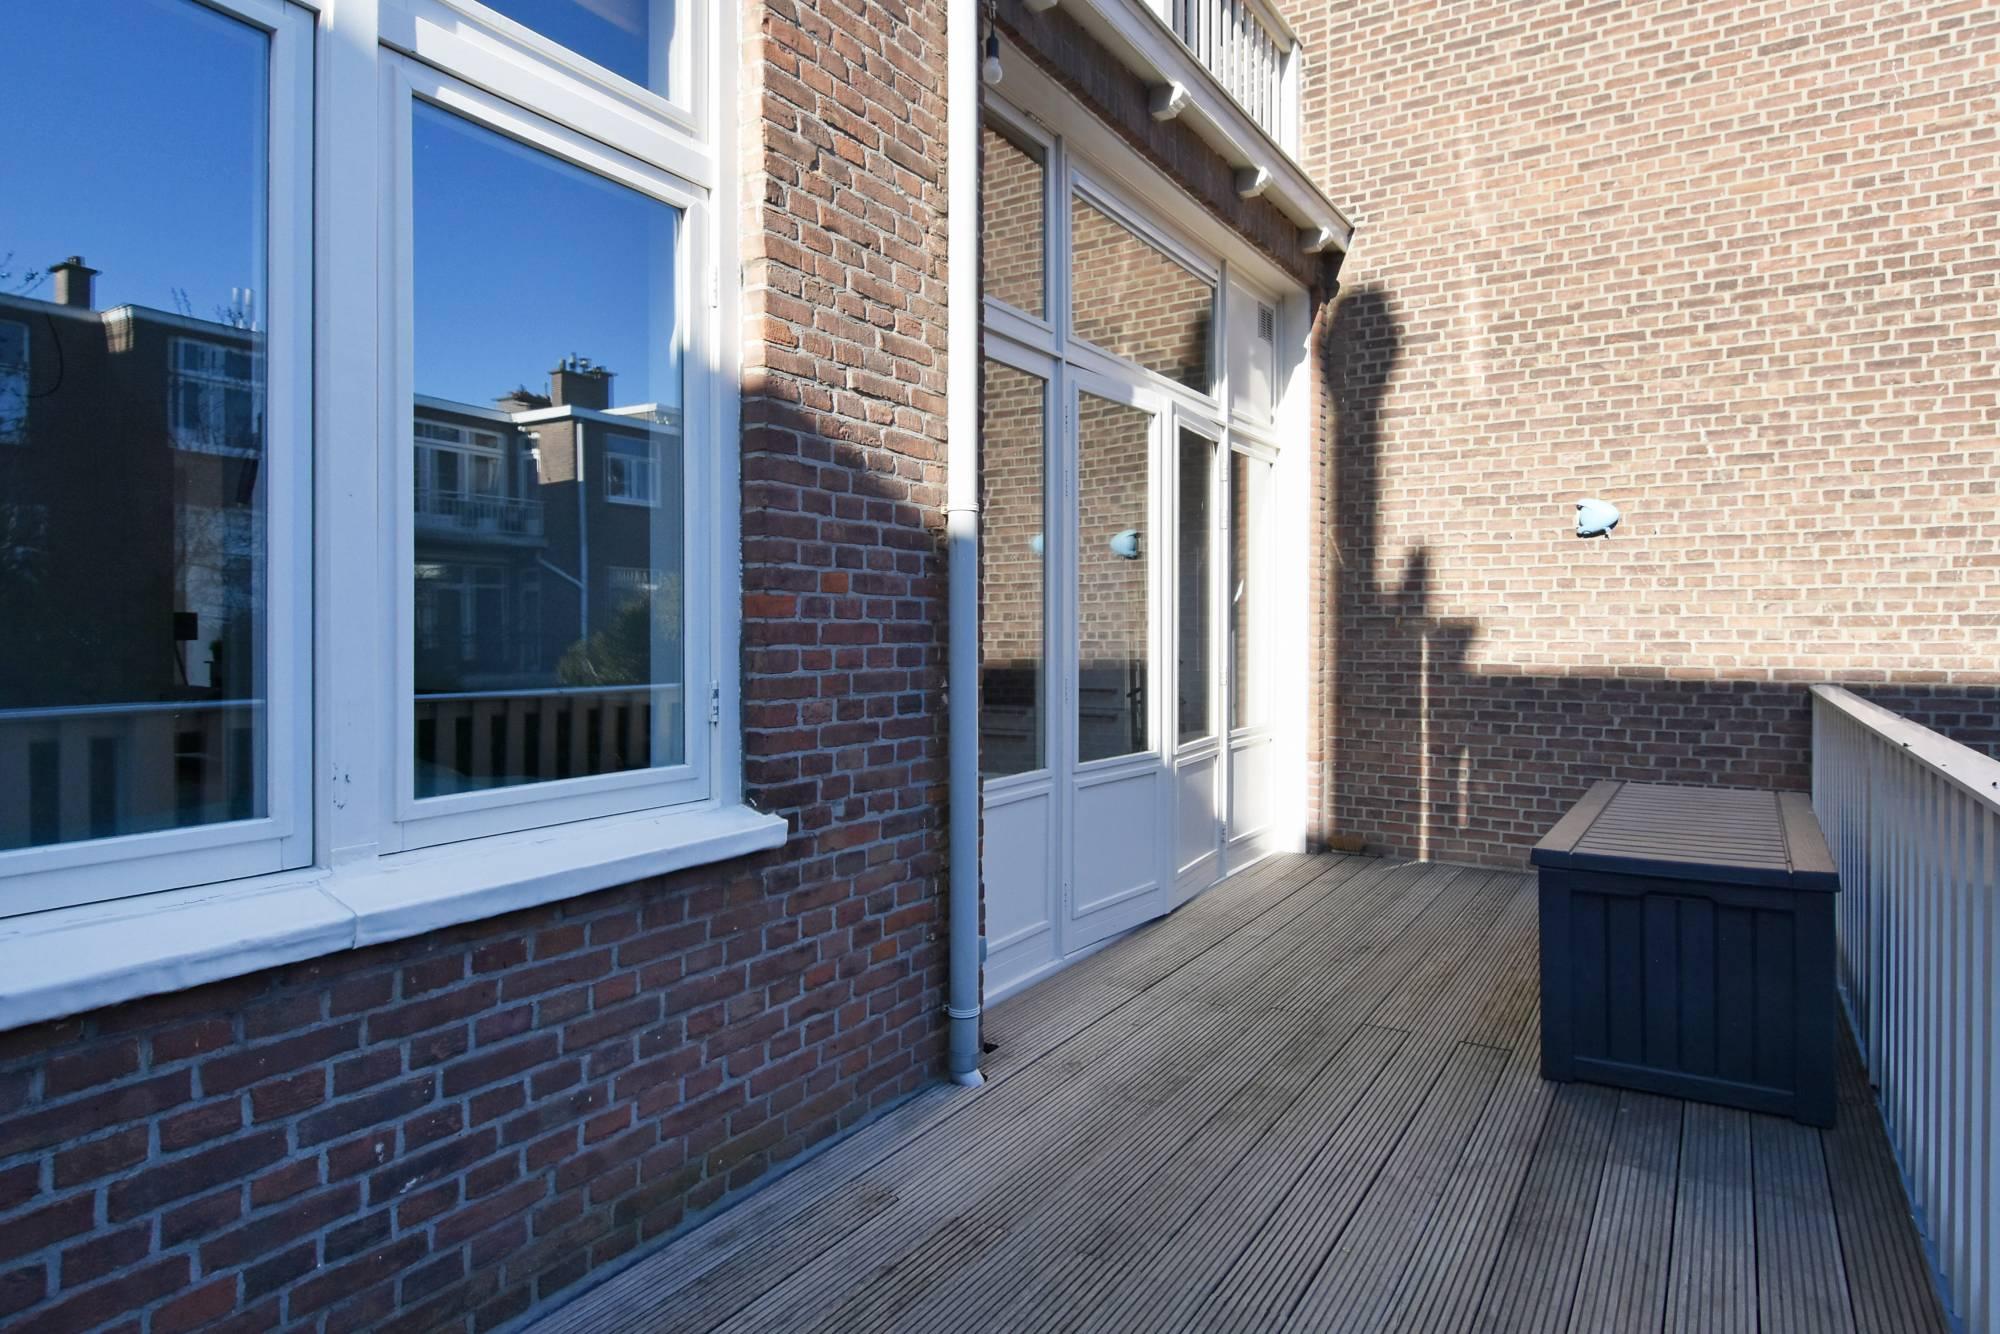 https://public.parariusoffice.nl/185/photos/huge/52003107.1554282537-454.JPG